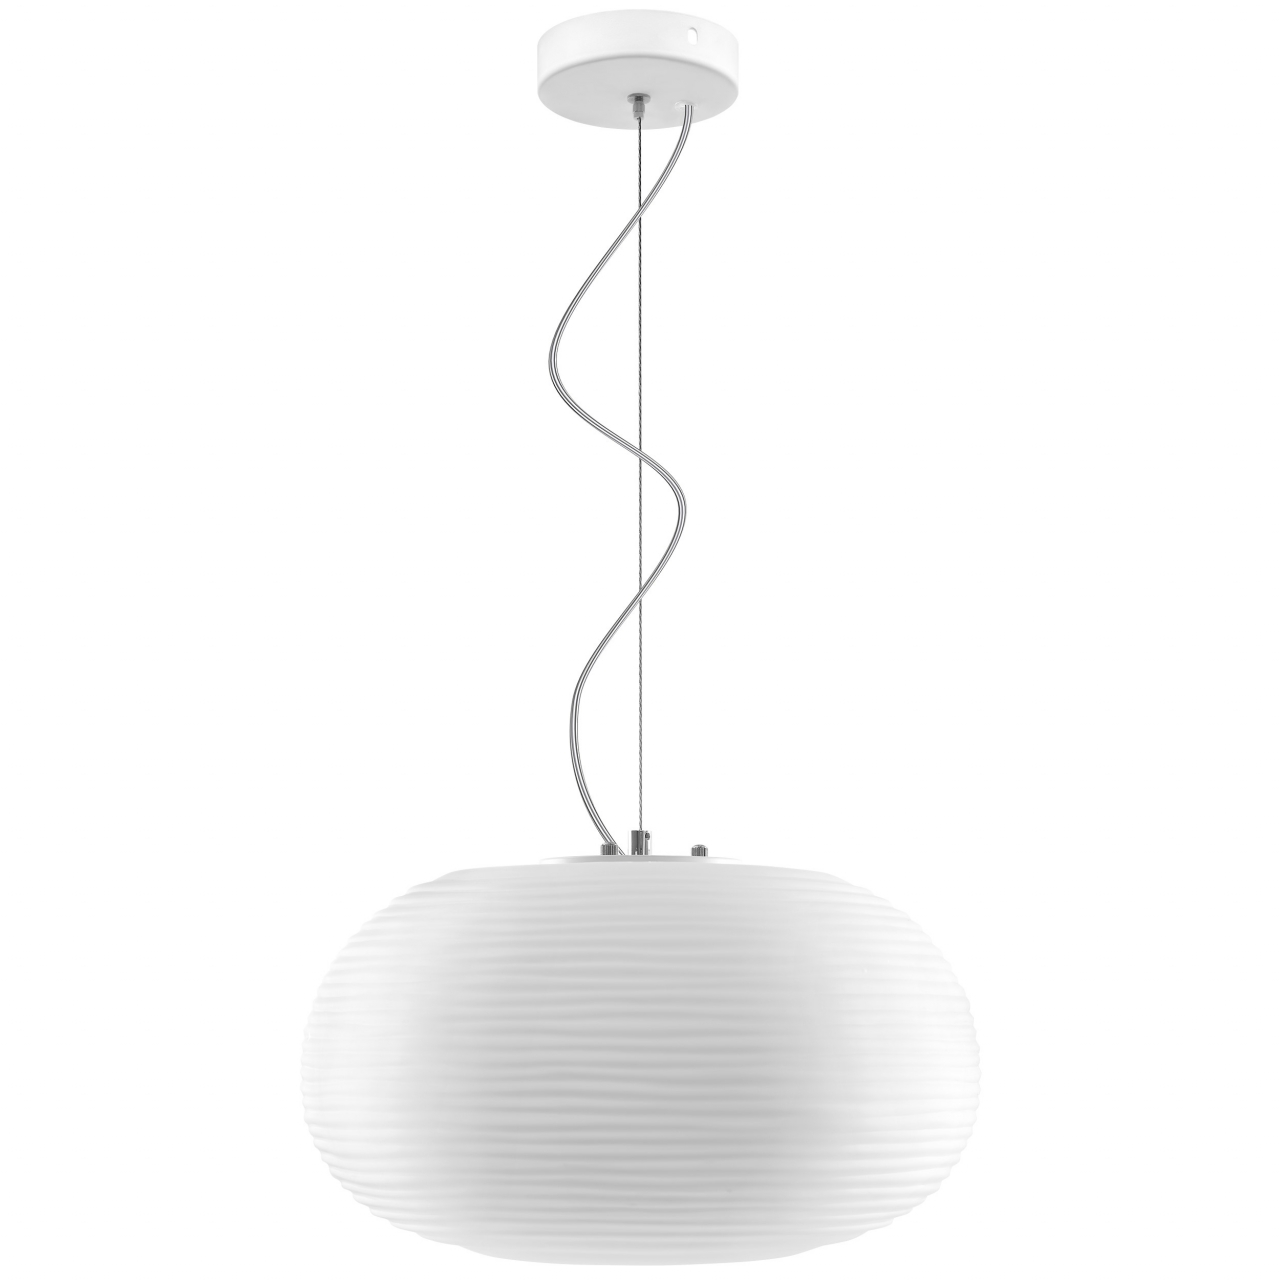 Люстра подвесная Arnia 1Х40W E27 Белый Lightstar 805013